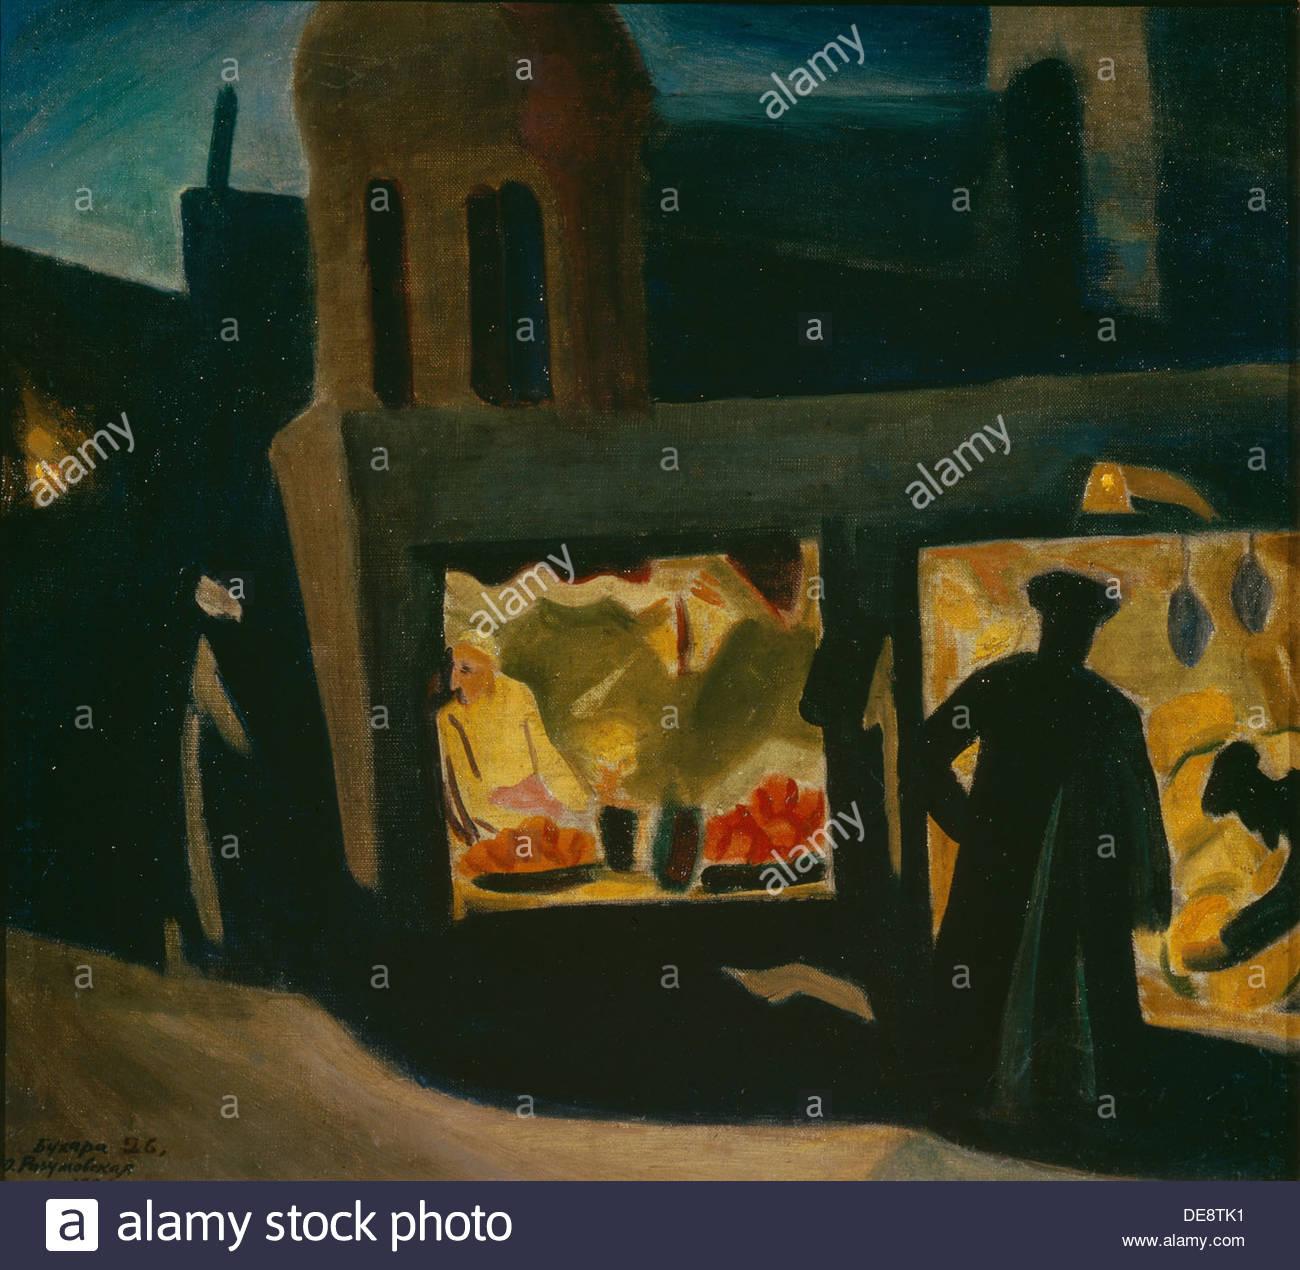 Bukhara. Evening Motif, 1926. Artist: Razumovskaya, Julia (1896-1987) - Stock Image